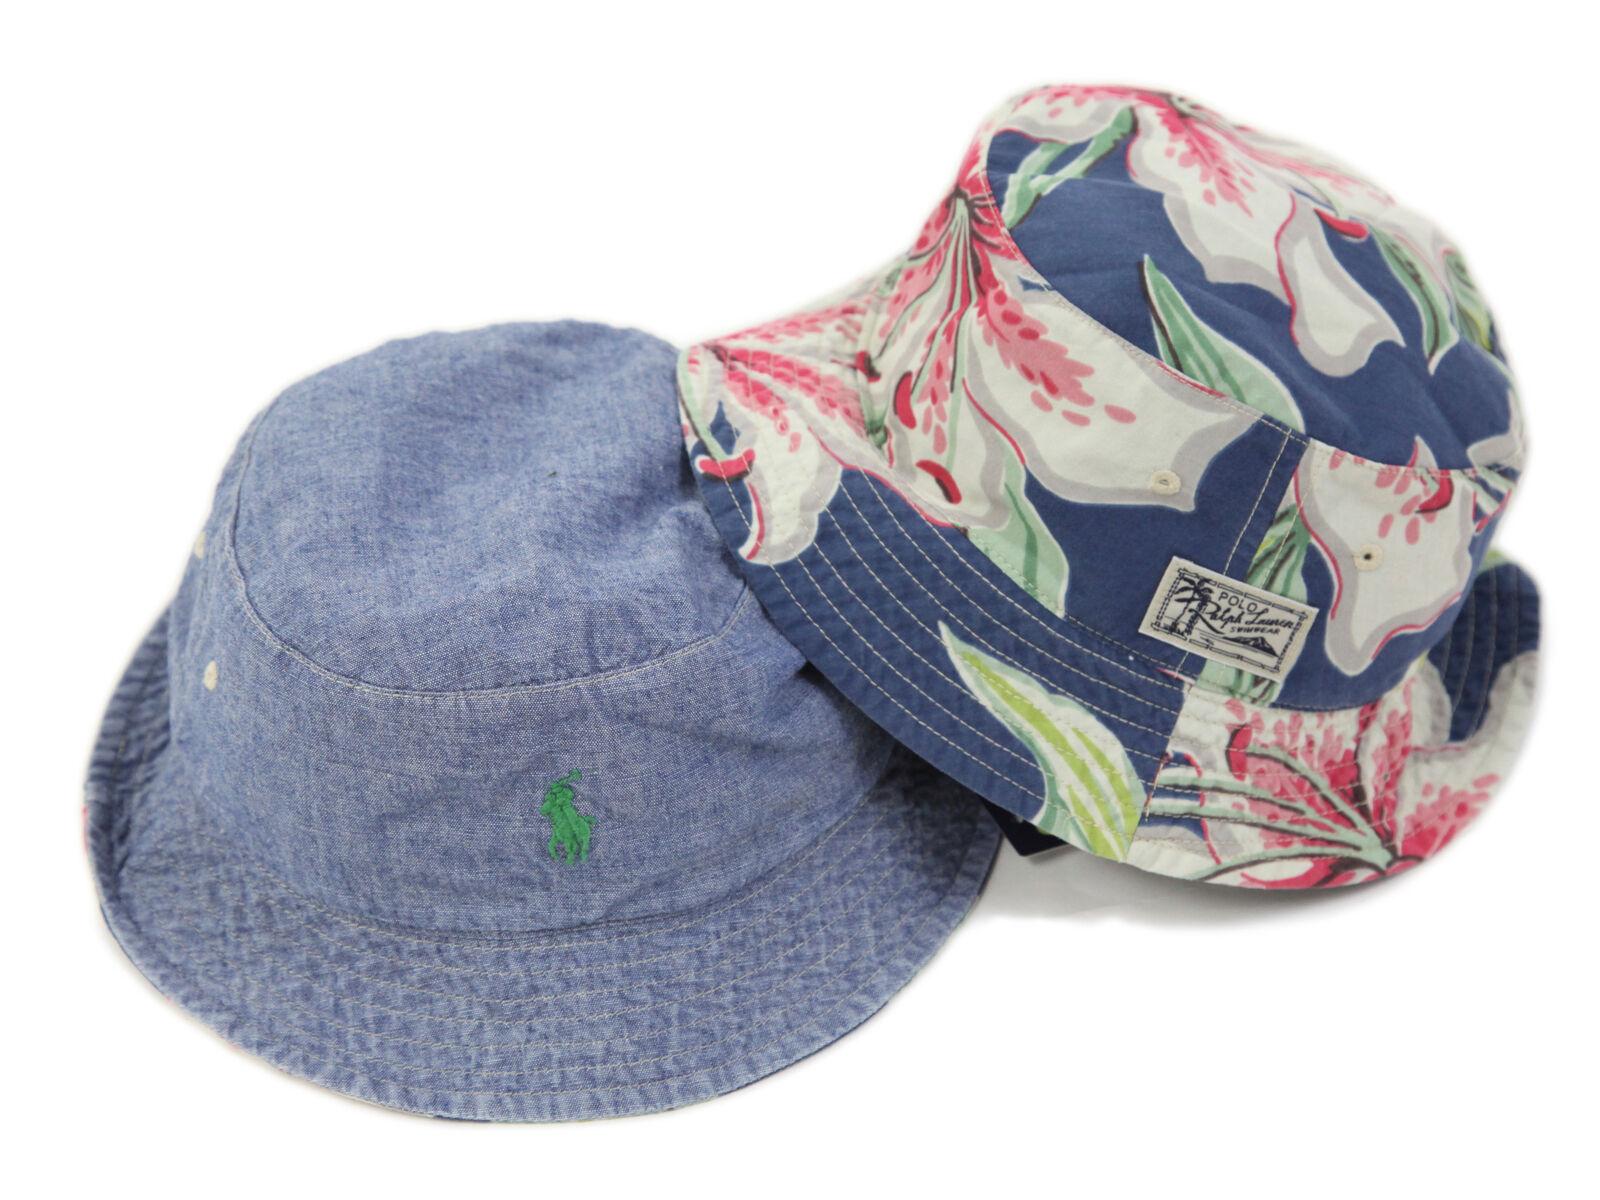 Polo Ralph Lauren Reversible Safari Bucket Hats Caps wpony floral aloha